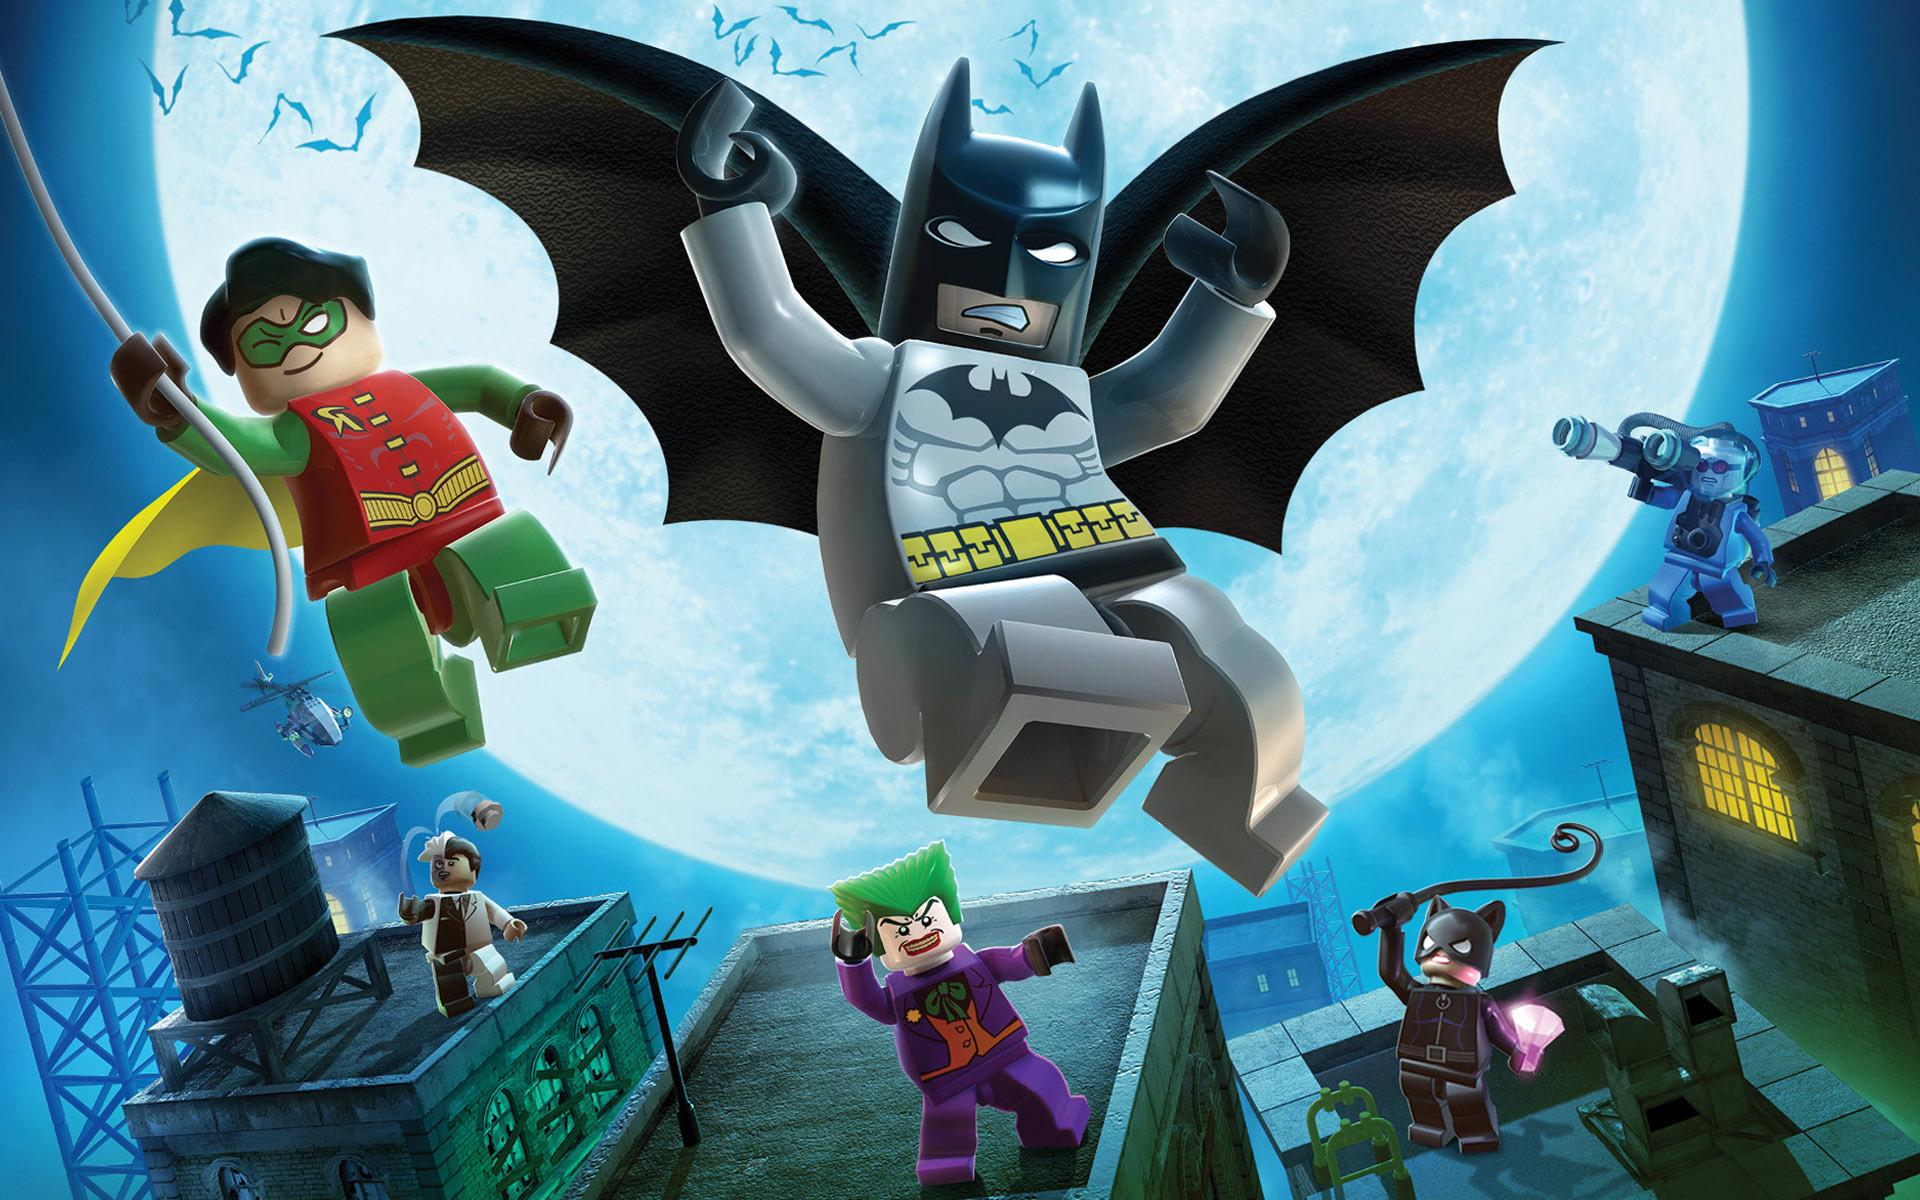 Download Batman and Robin Lego figurines wallpaper 1920x1200